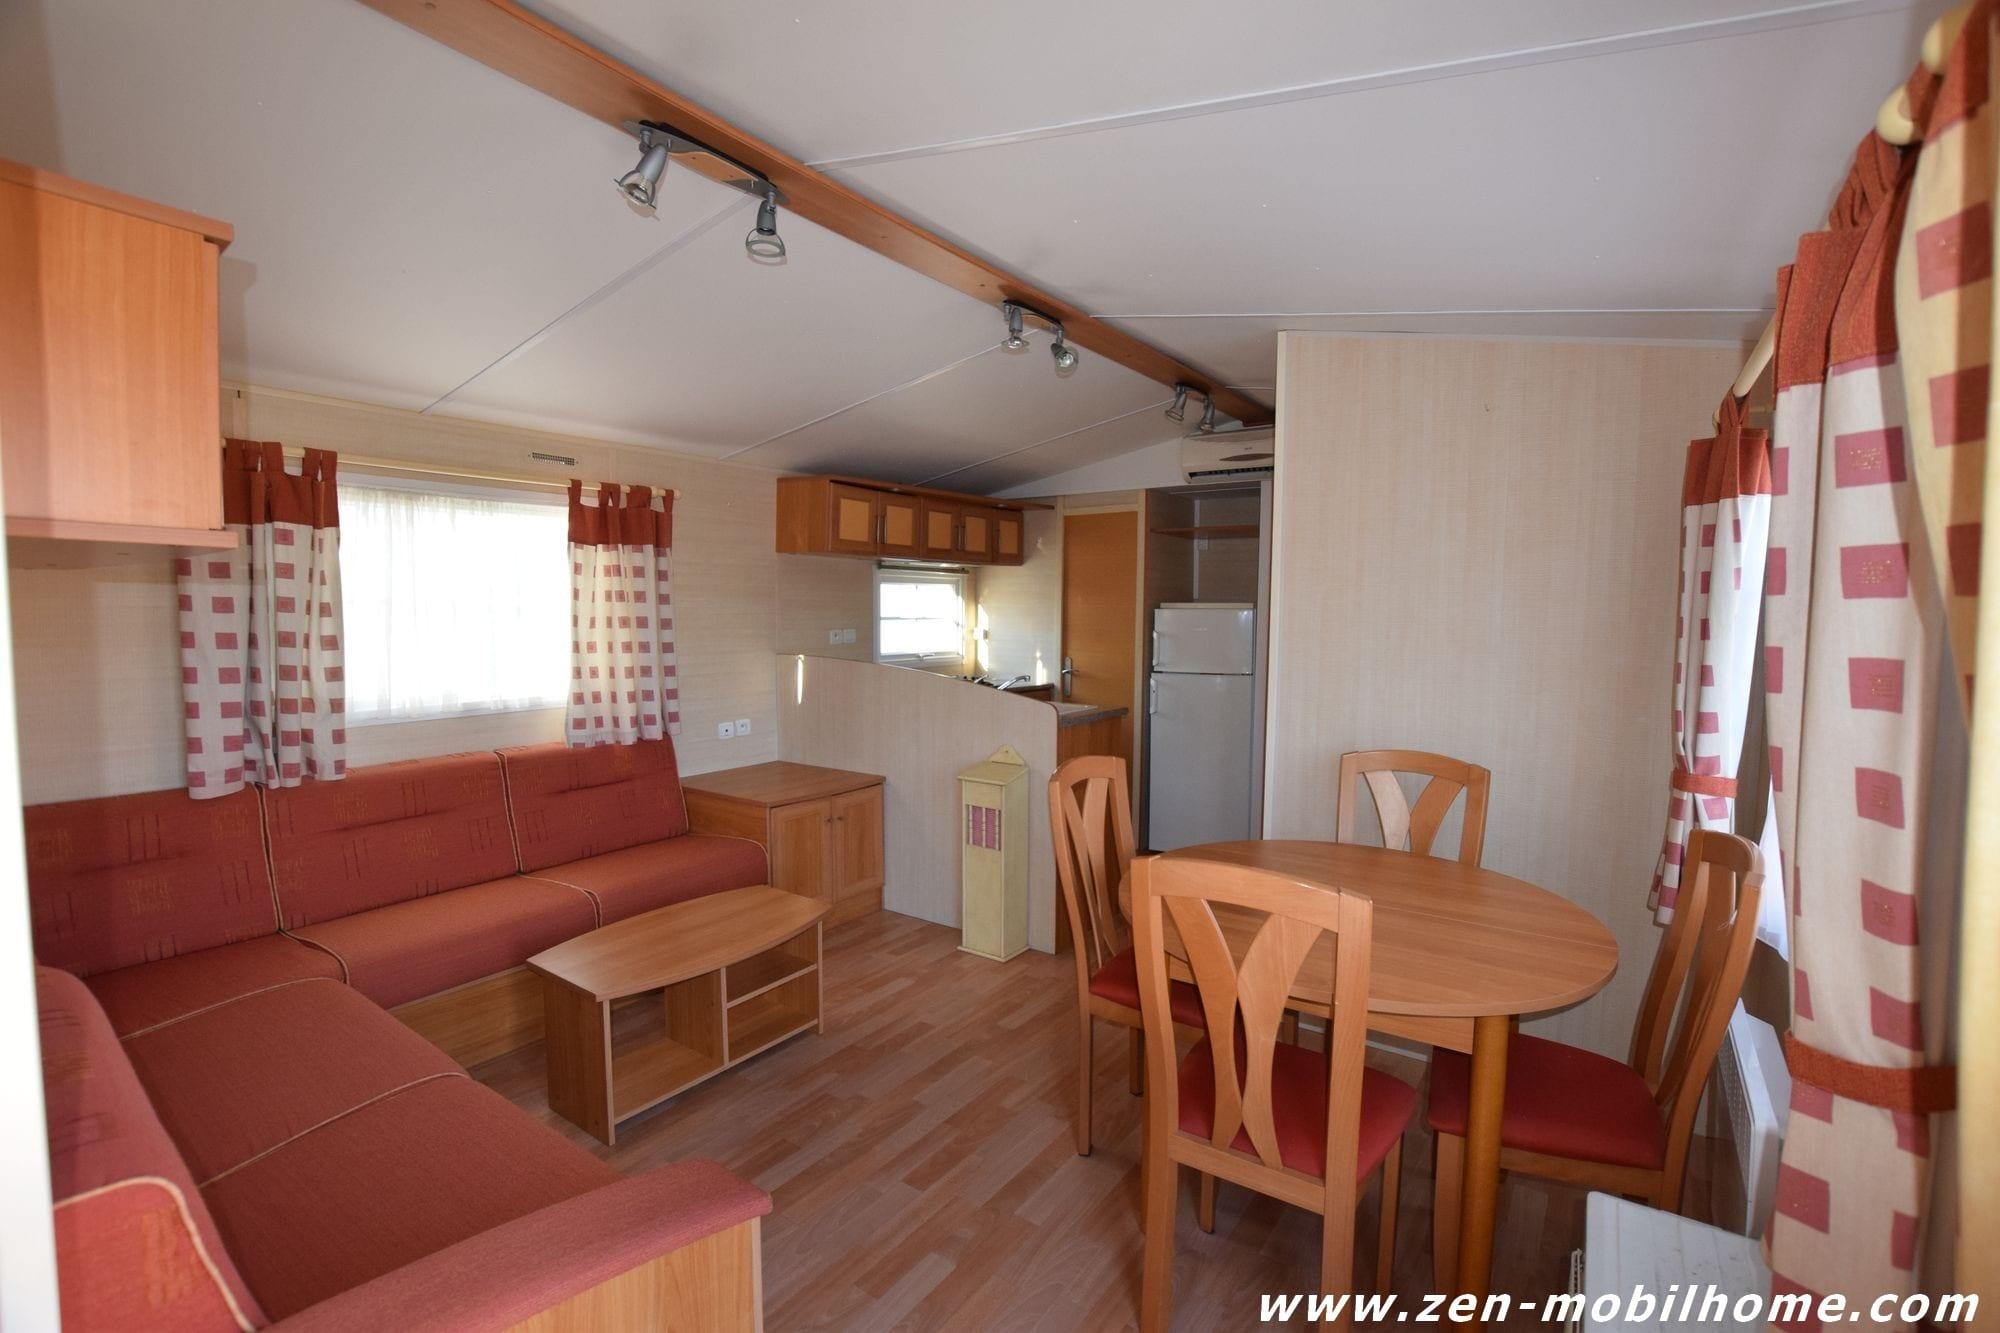 Rapidhome harmony 2004 mobil home occ 13 000 zen for Mobil home louisiane 3 chambres prix